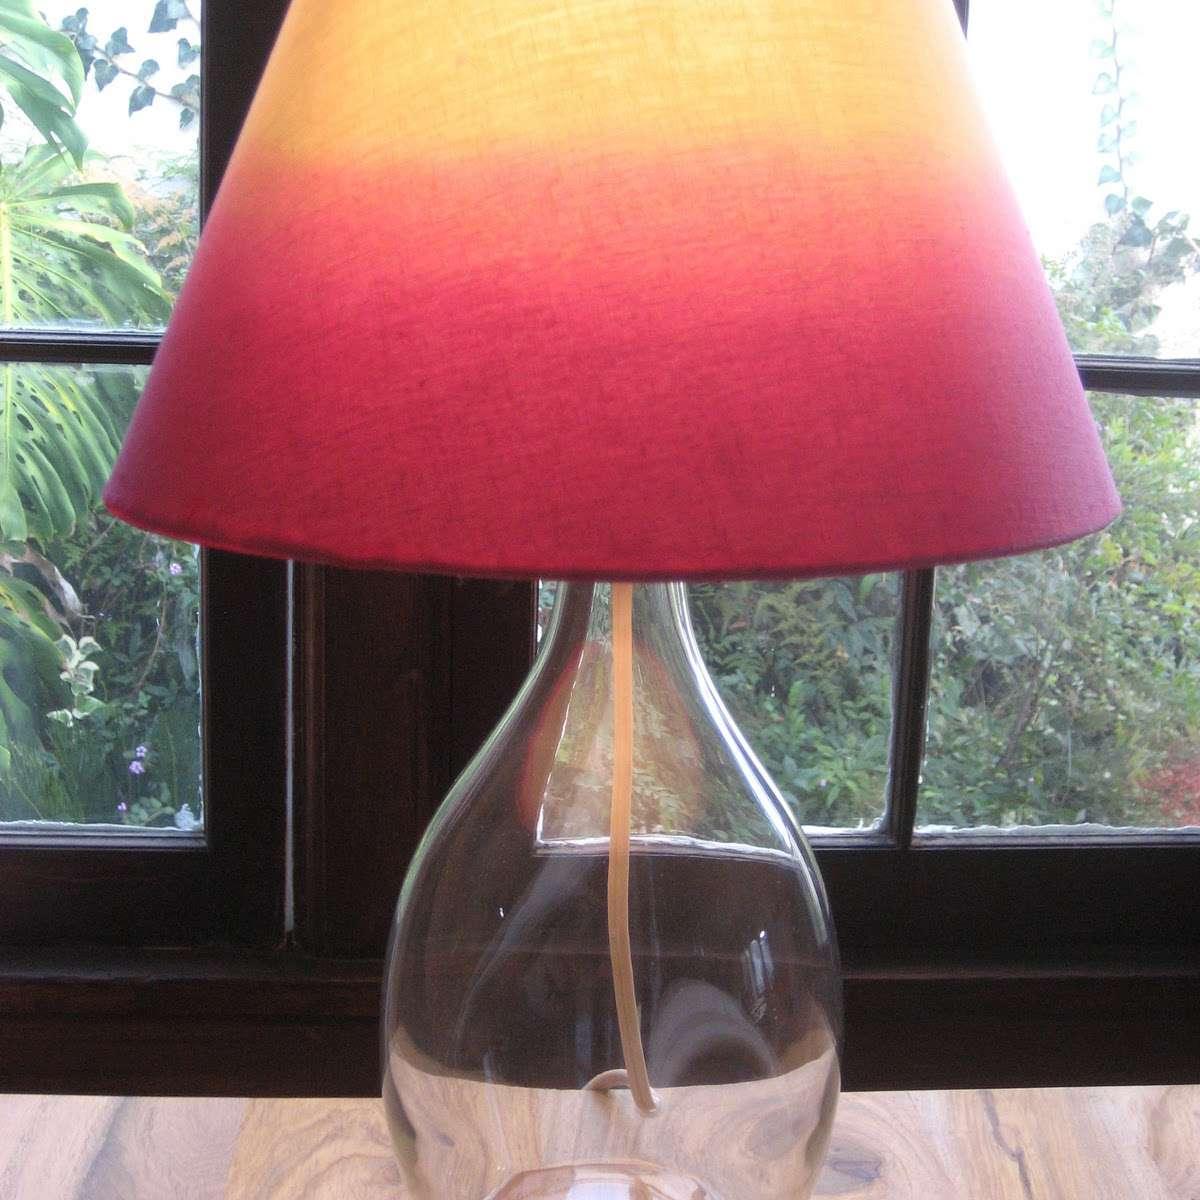 DIY Ombre Lampshade